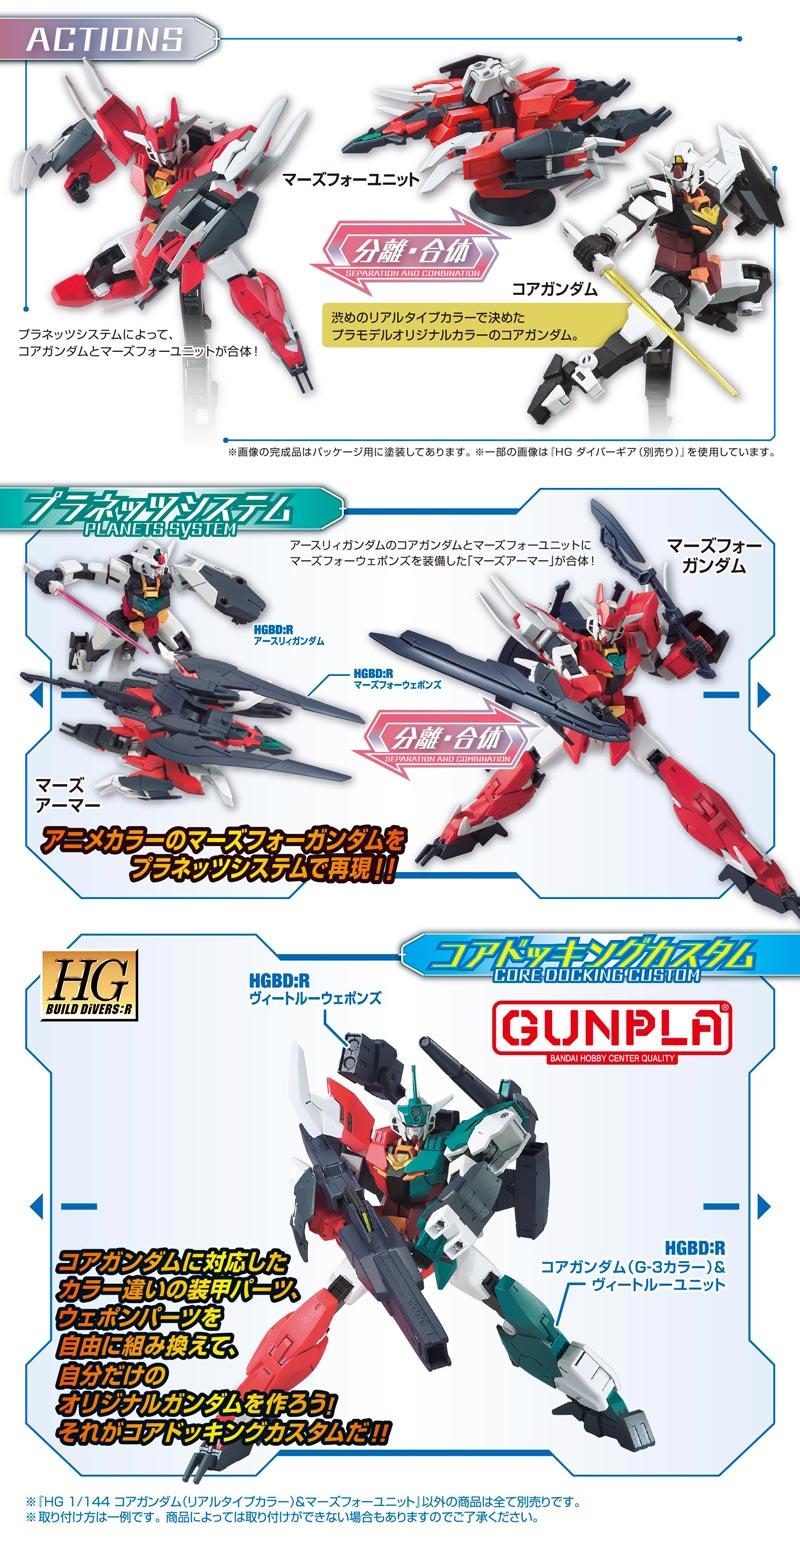 HGBD:R Core Gundam (Real Type Color) & Marsfour Unit Detail